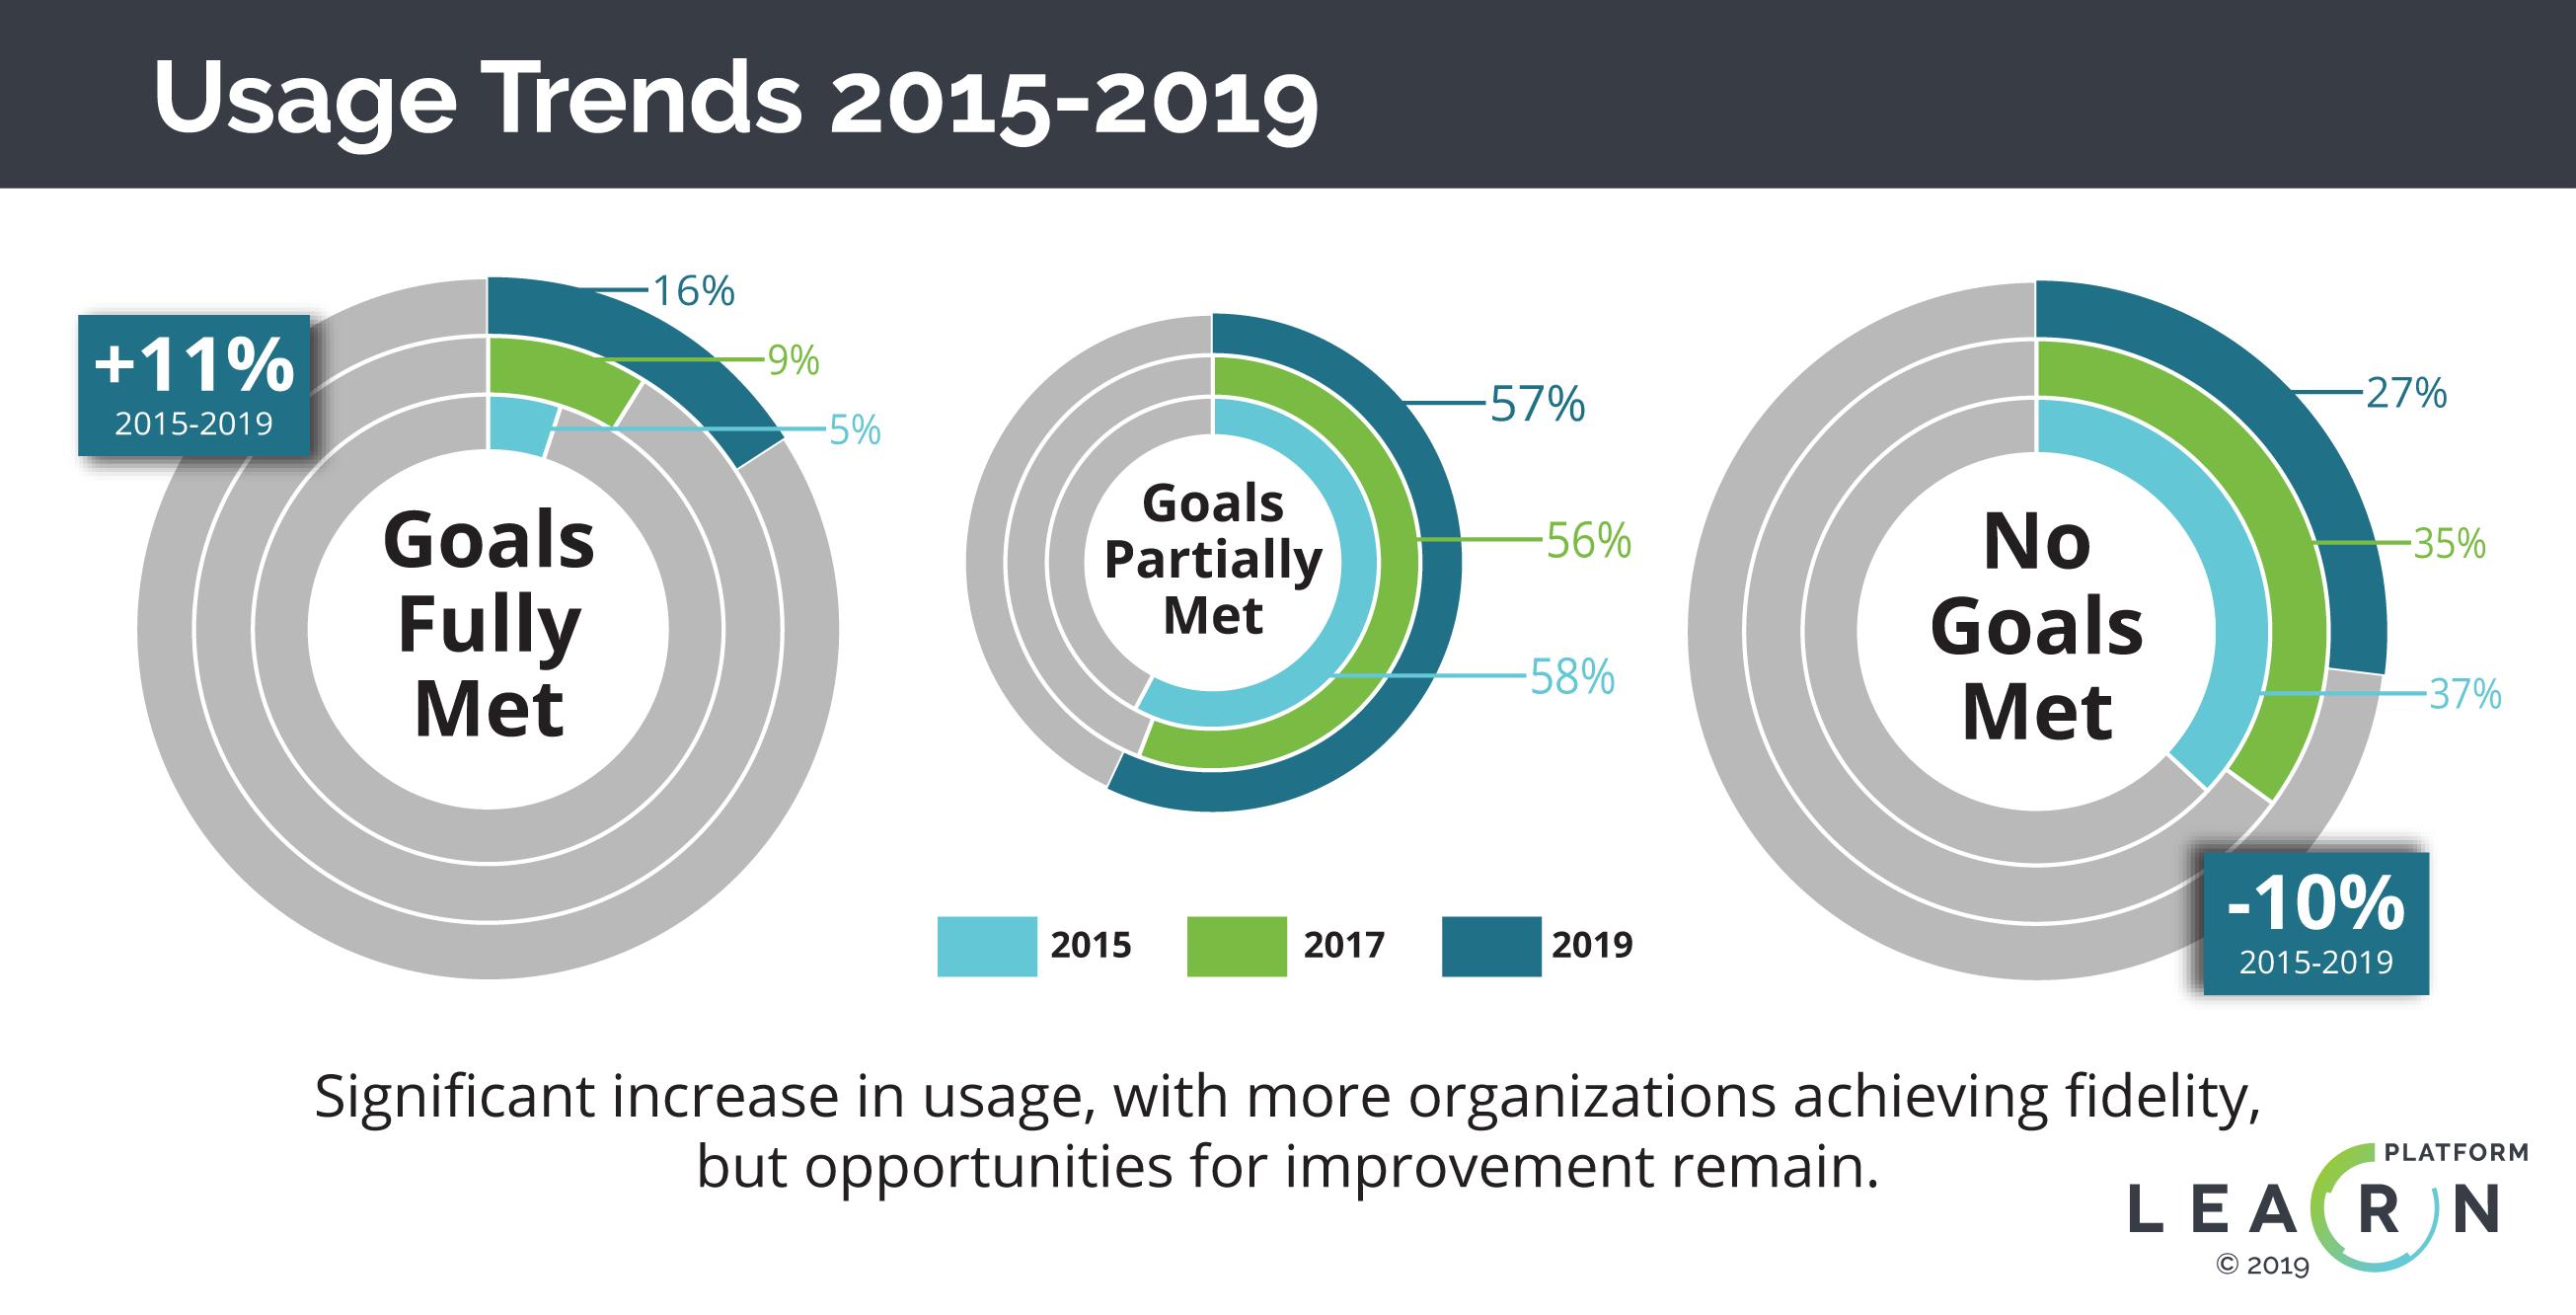 EdTech Usage Trends-LearnPlatform 2019